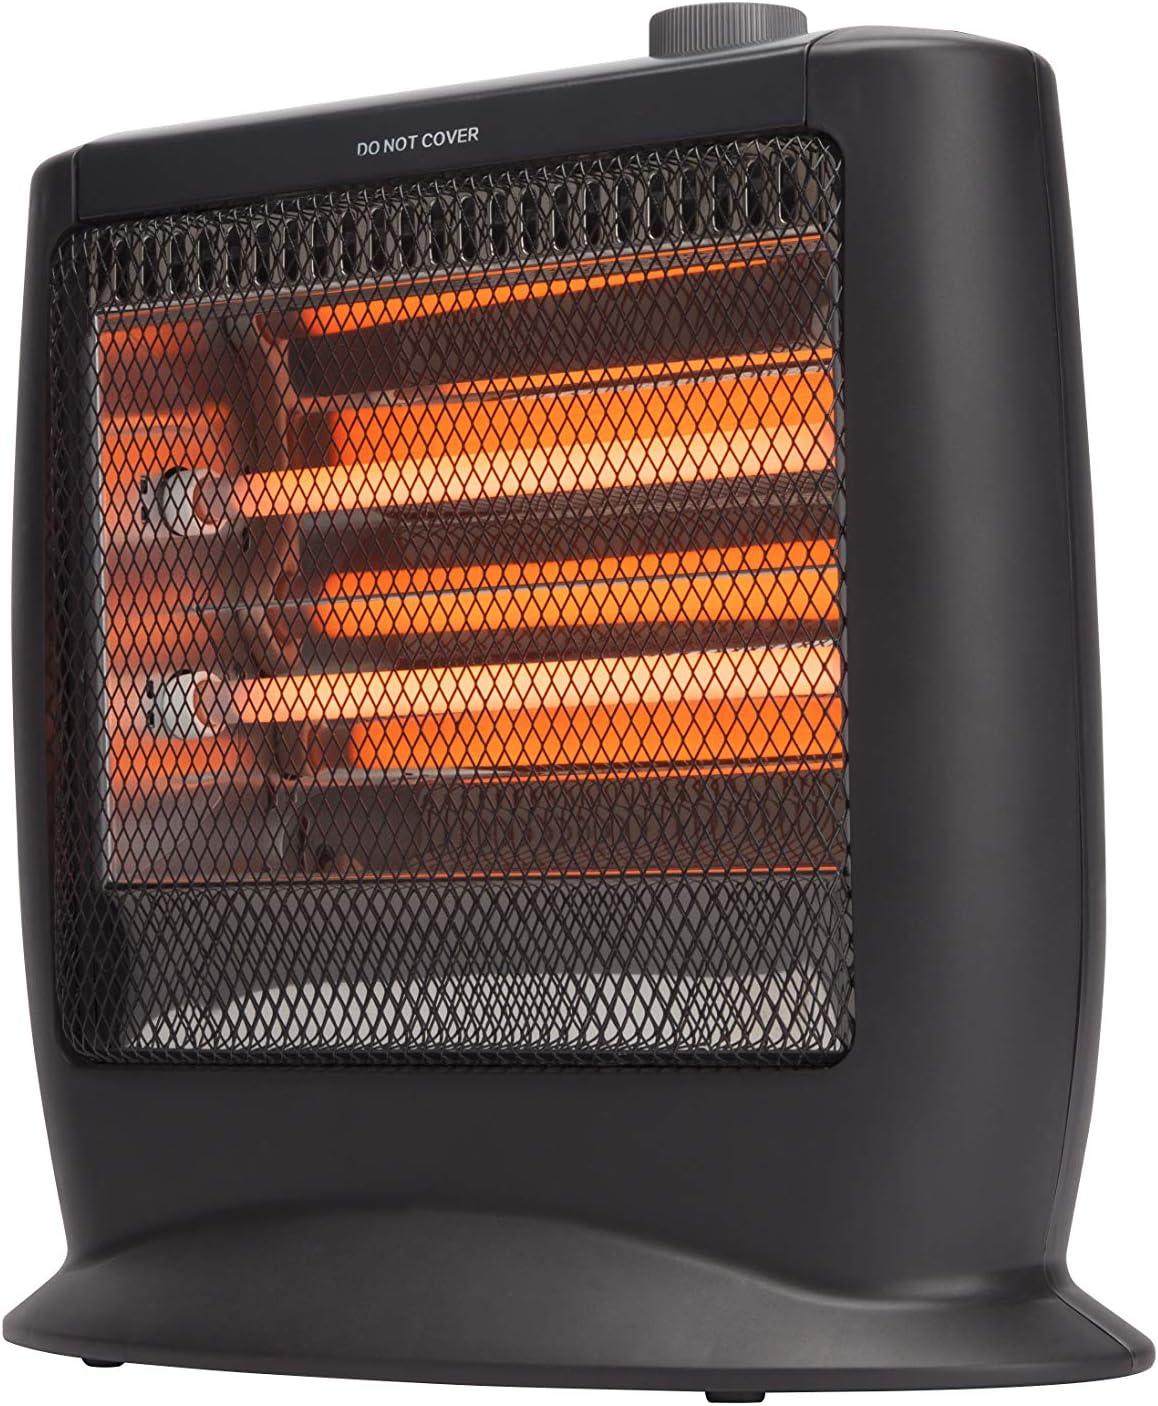 Goldair Radiant Heater